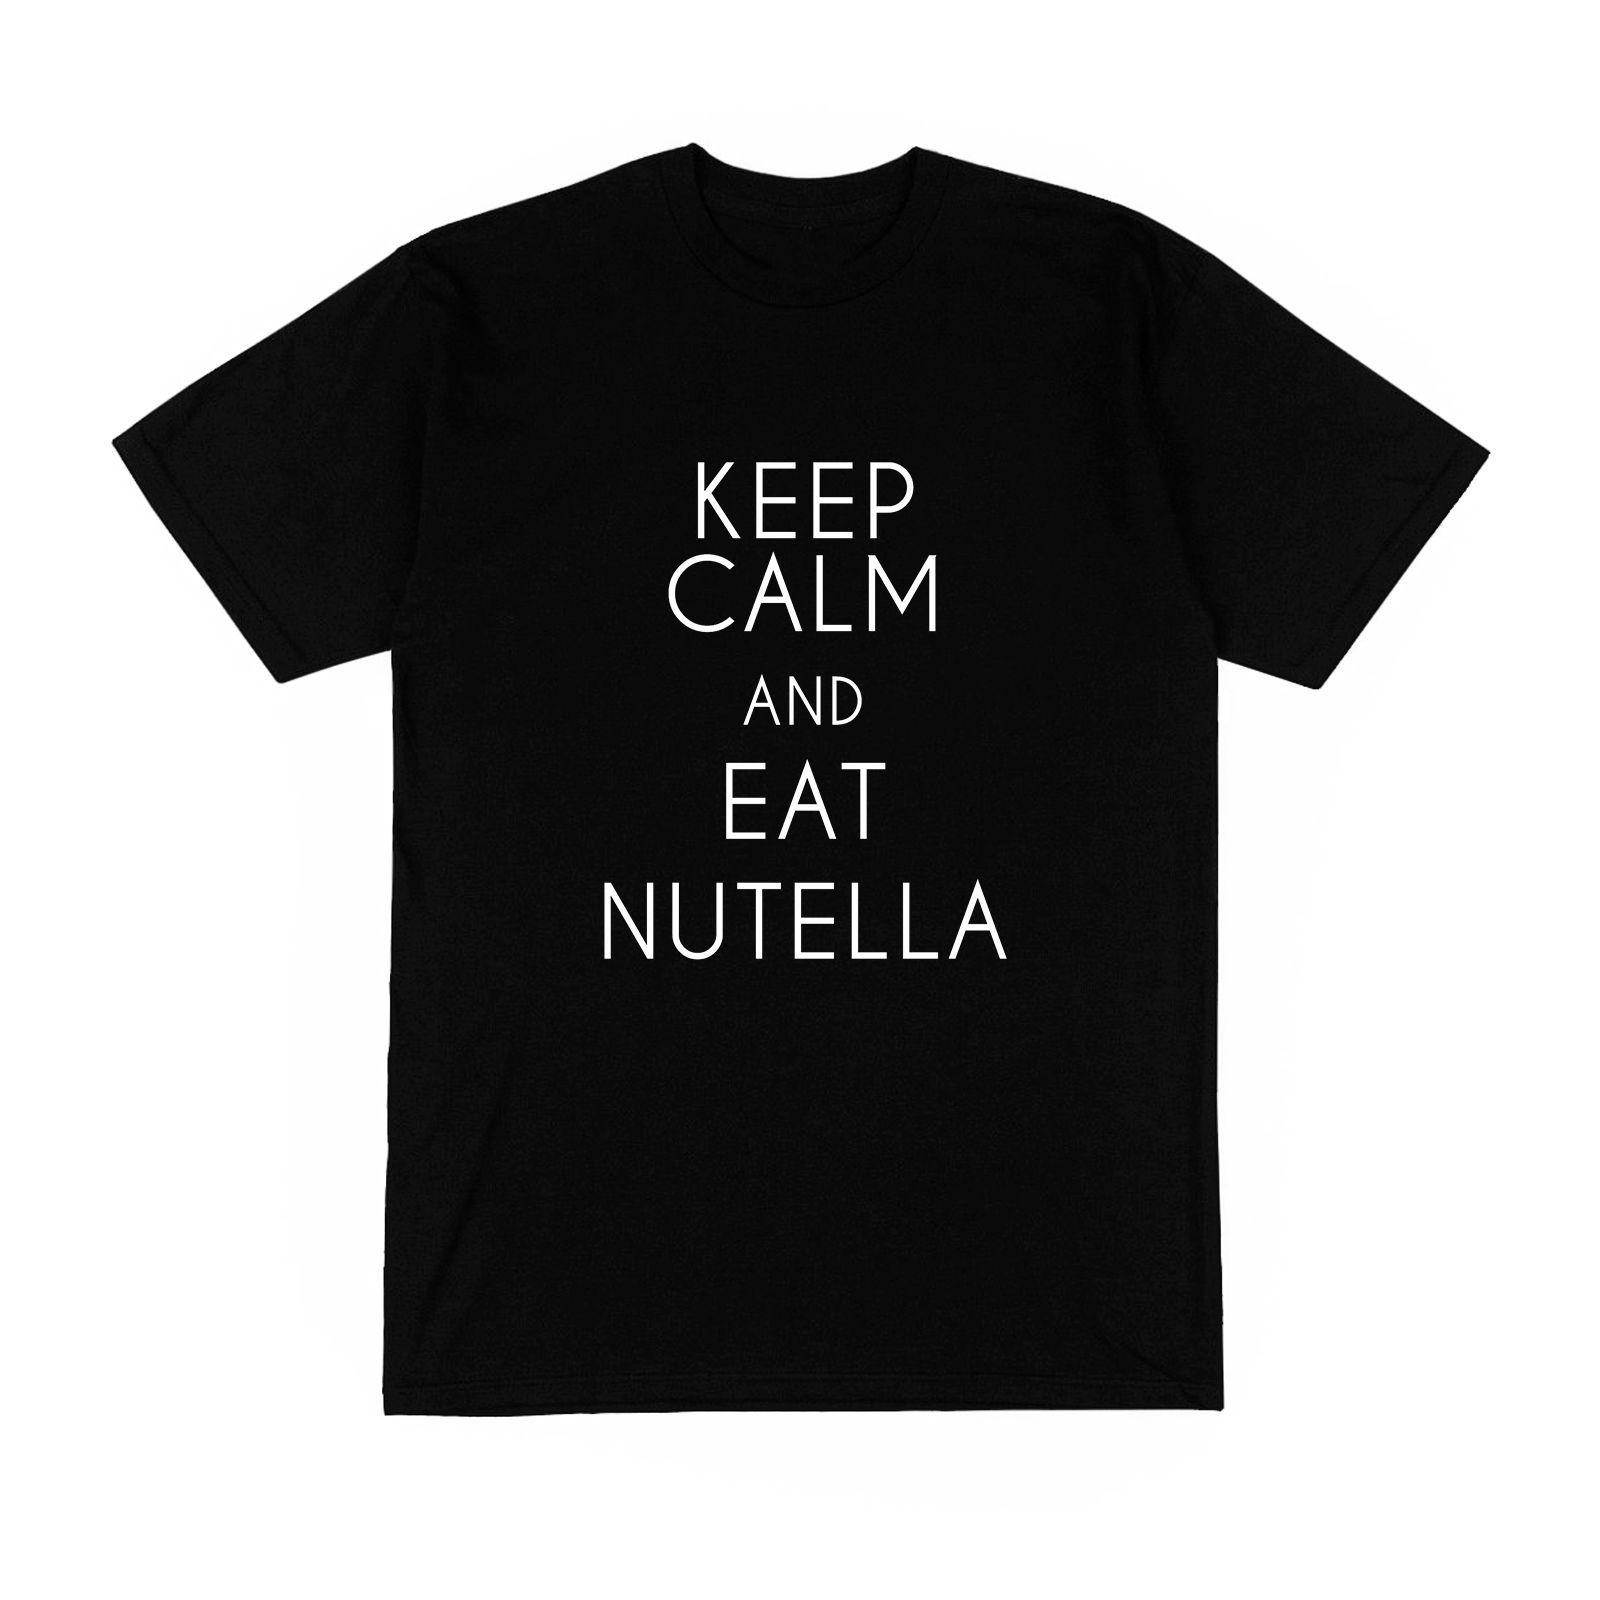 Camiseta Homme Monsieur Garde Ton Calme Mange Du Nutella Frase Humor Divertido